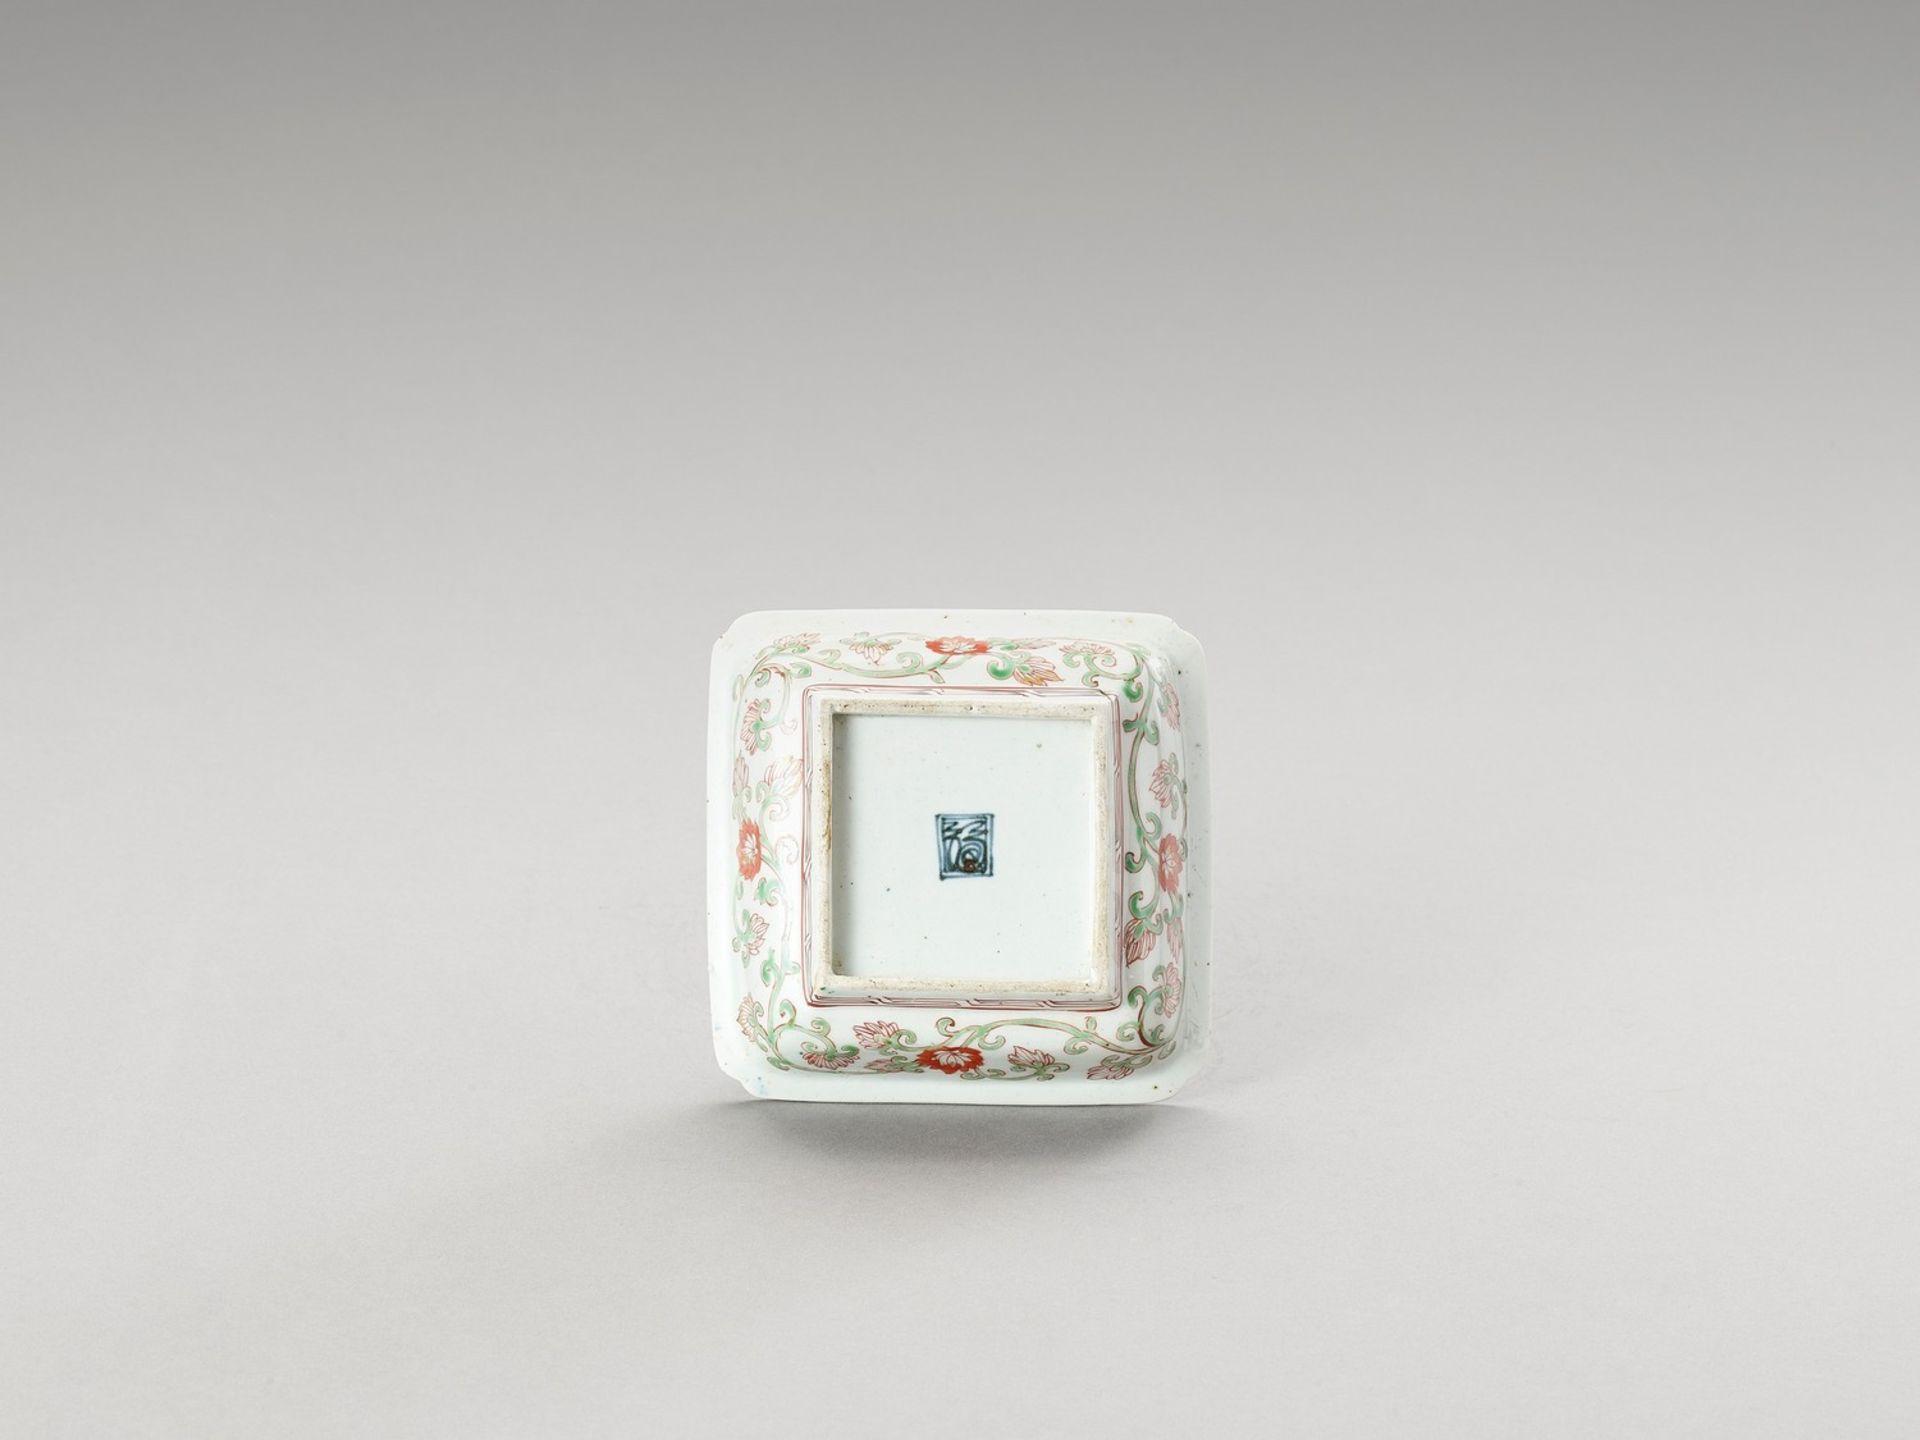 A SMALL SQUARE IMARI PORCELAIN DISH - Image 4 of 4